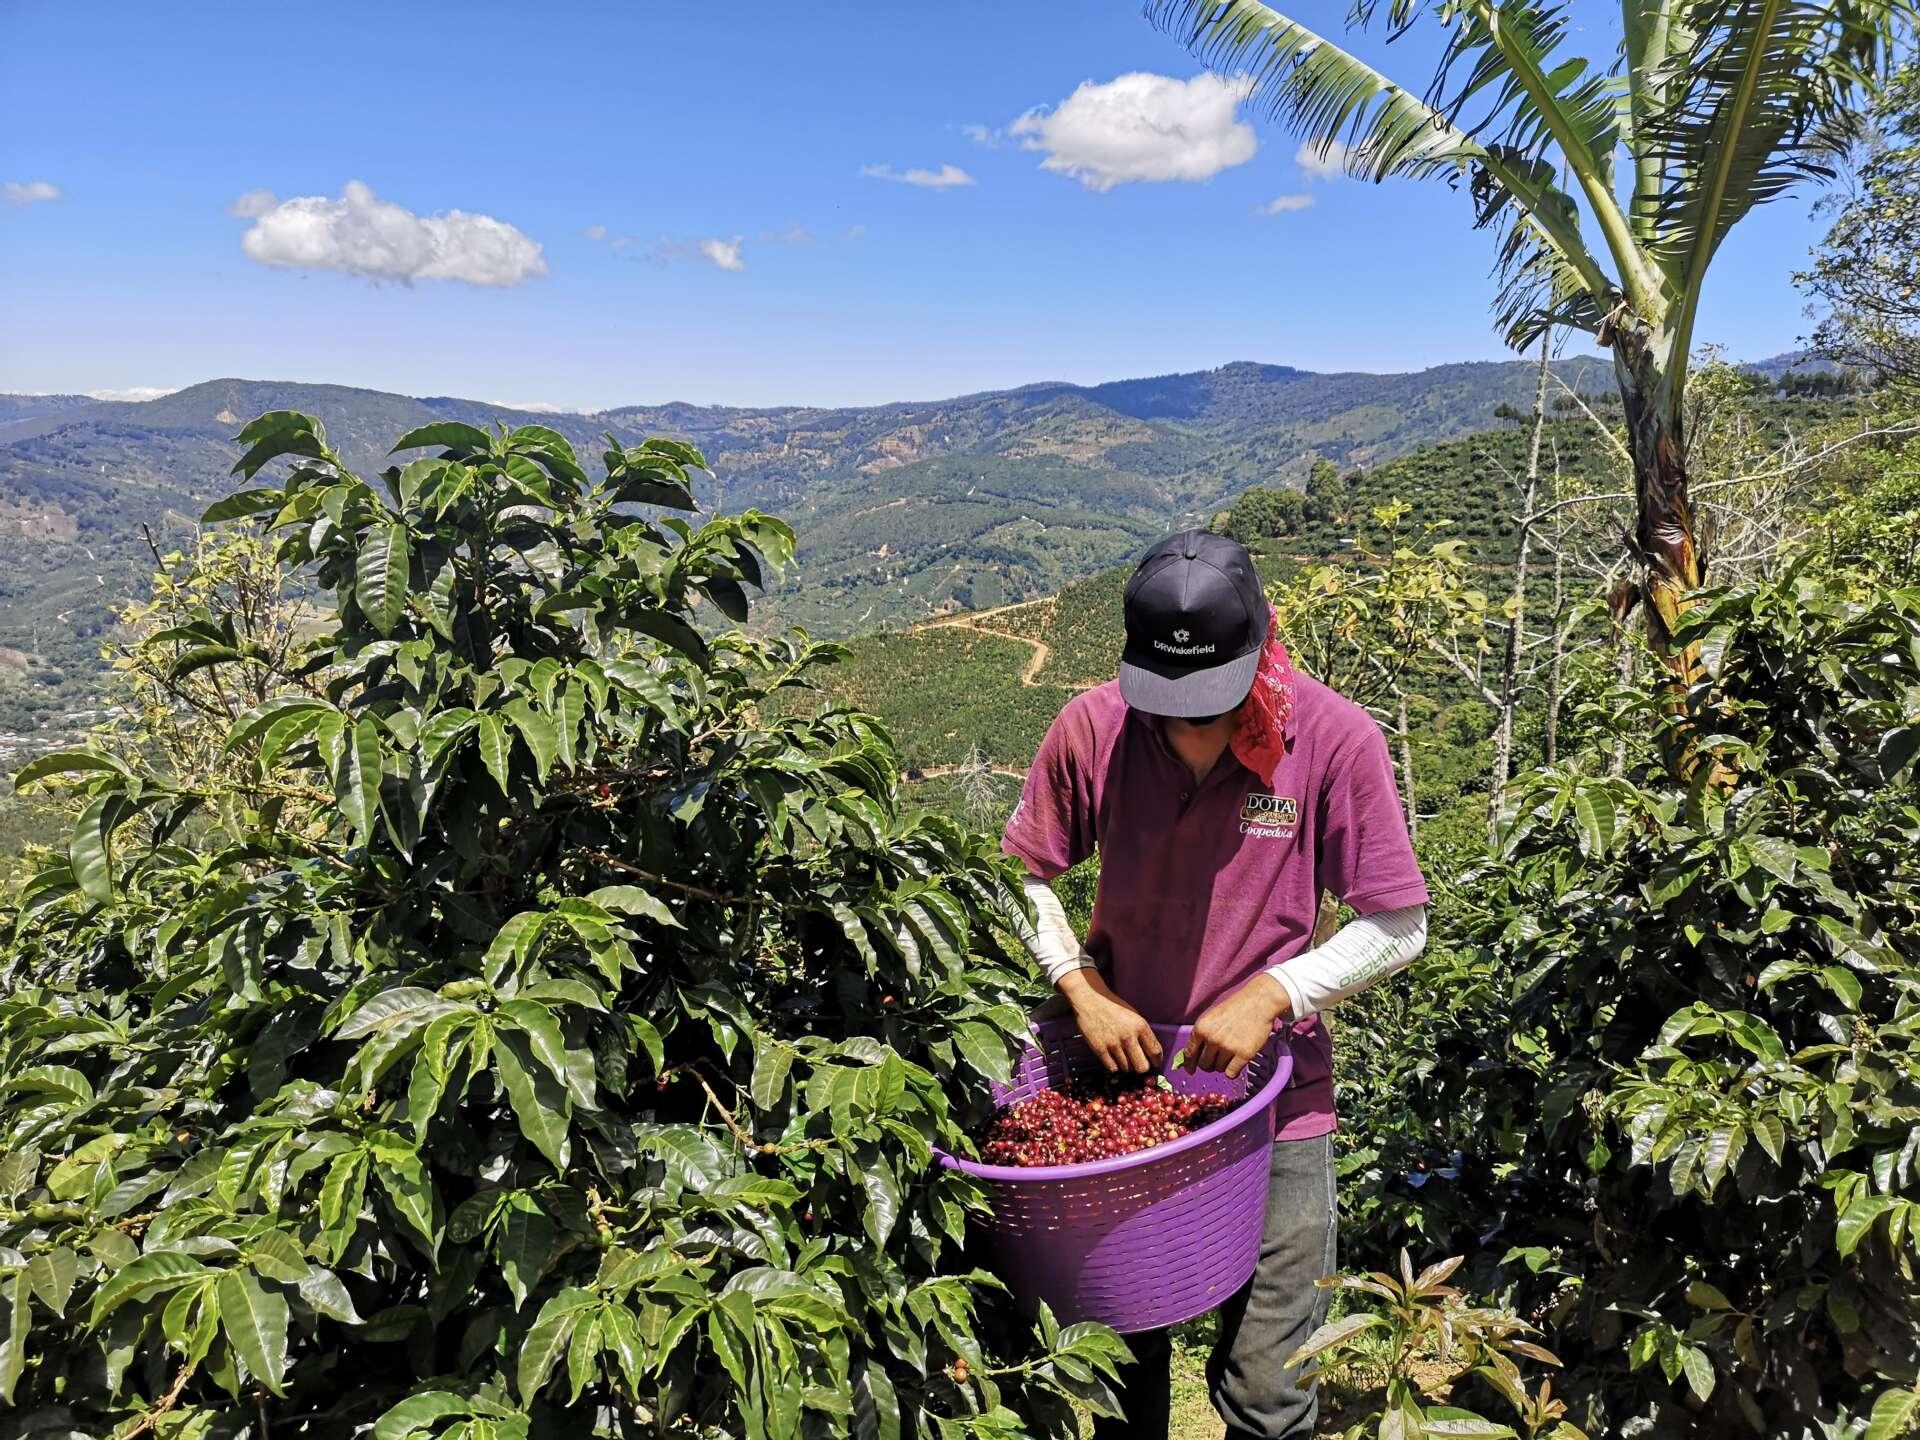 Java republic picking coffee beans